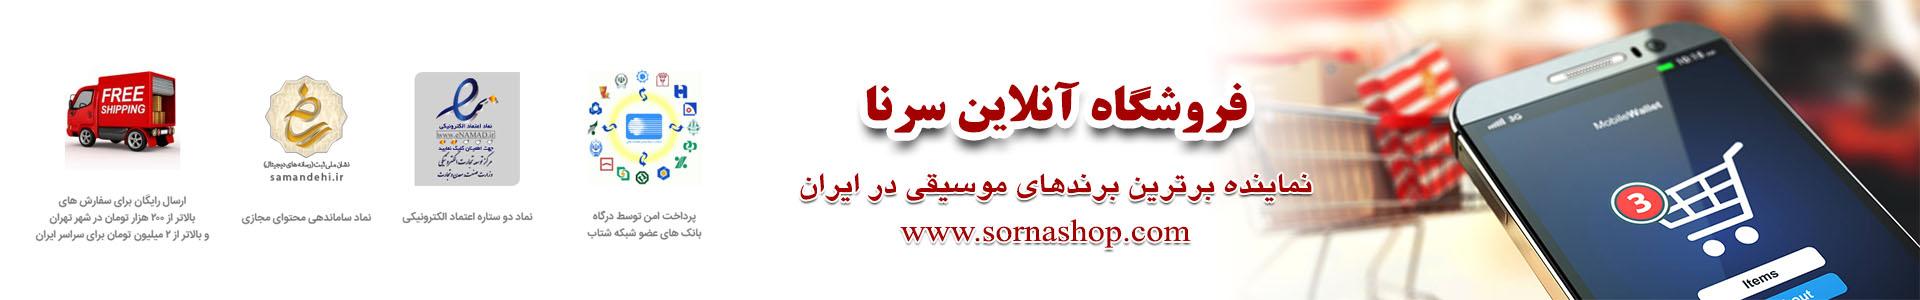 فروشگاه آنلاین تخصصی سرنا شاپ